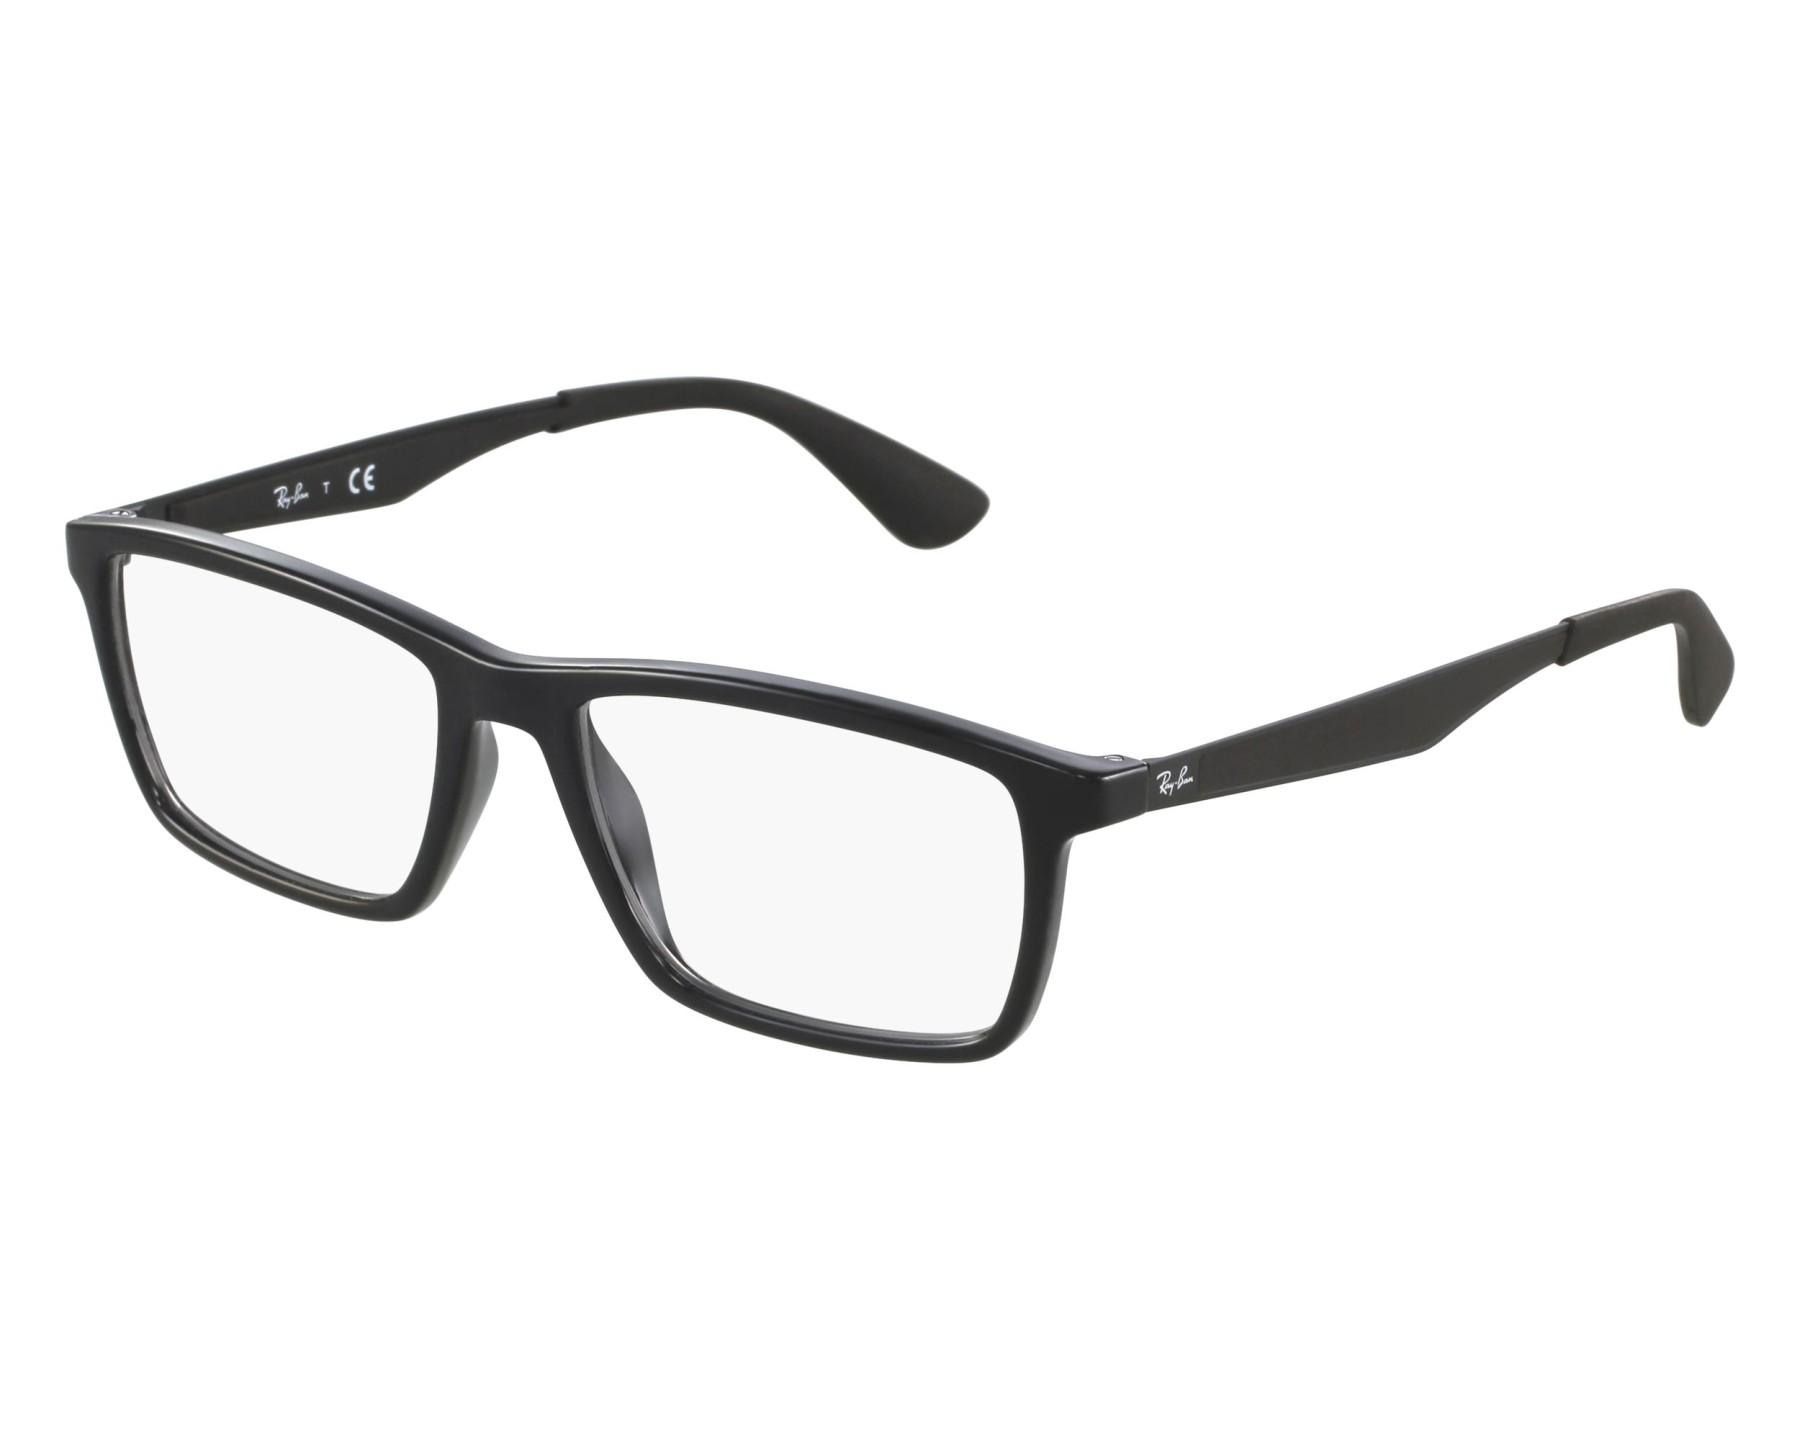 17dfc5026b eyeglasses Ray-Ban RX-7056 2000 53-17 Black Black front view